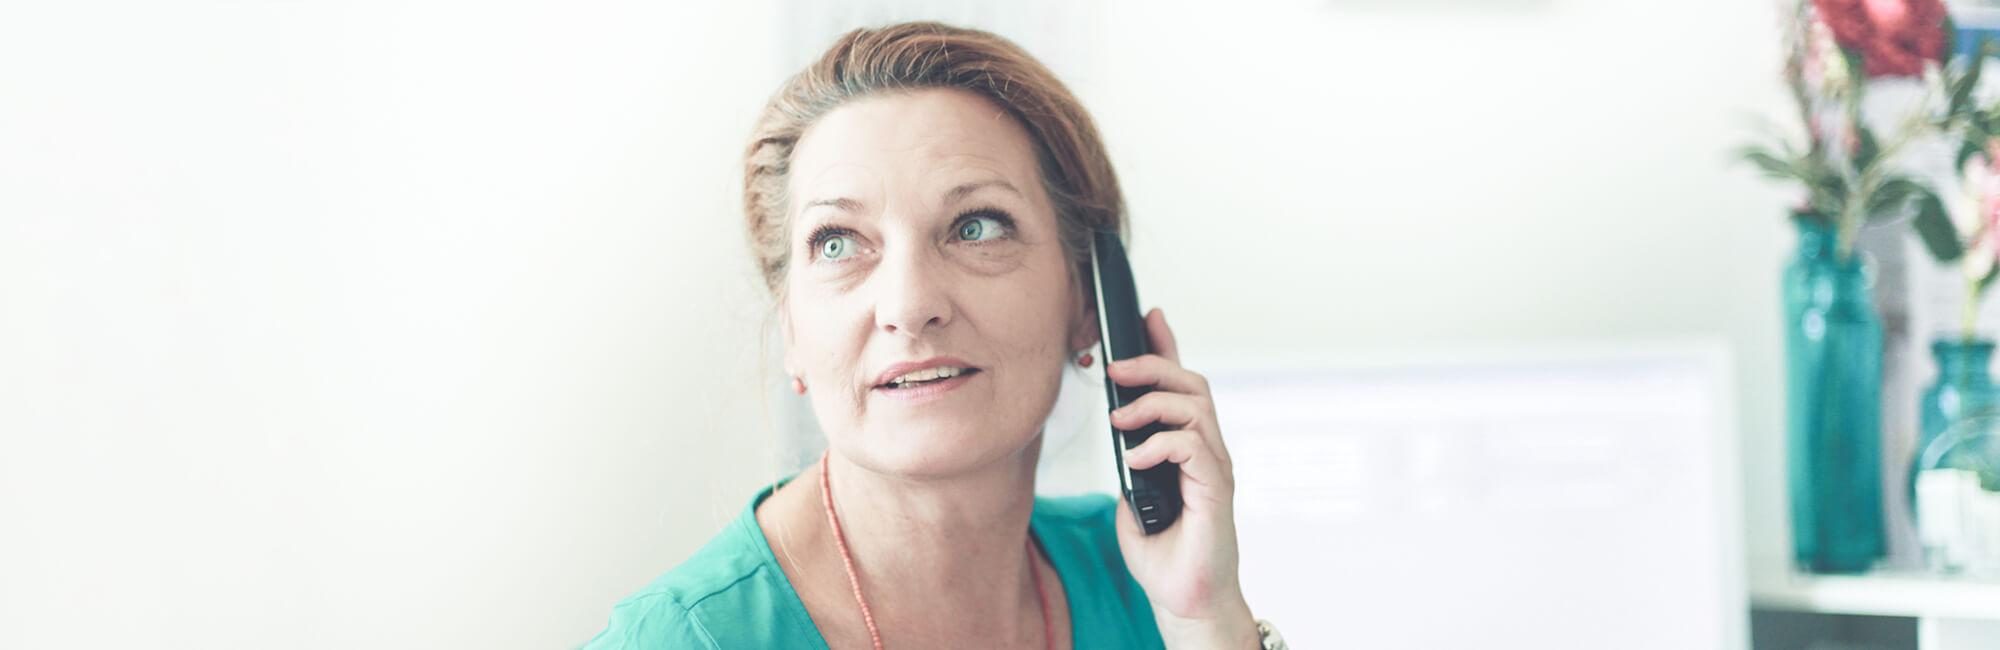 Arthrosetherapie Berlin - Dr. Völker - Slider Online-Terminvergabe